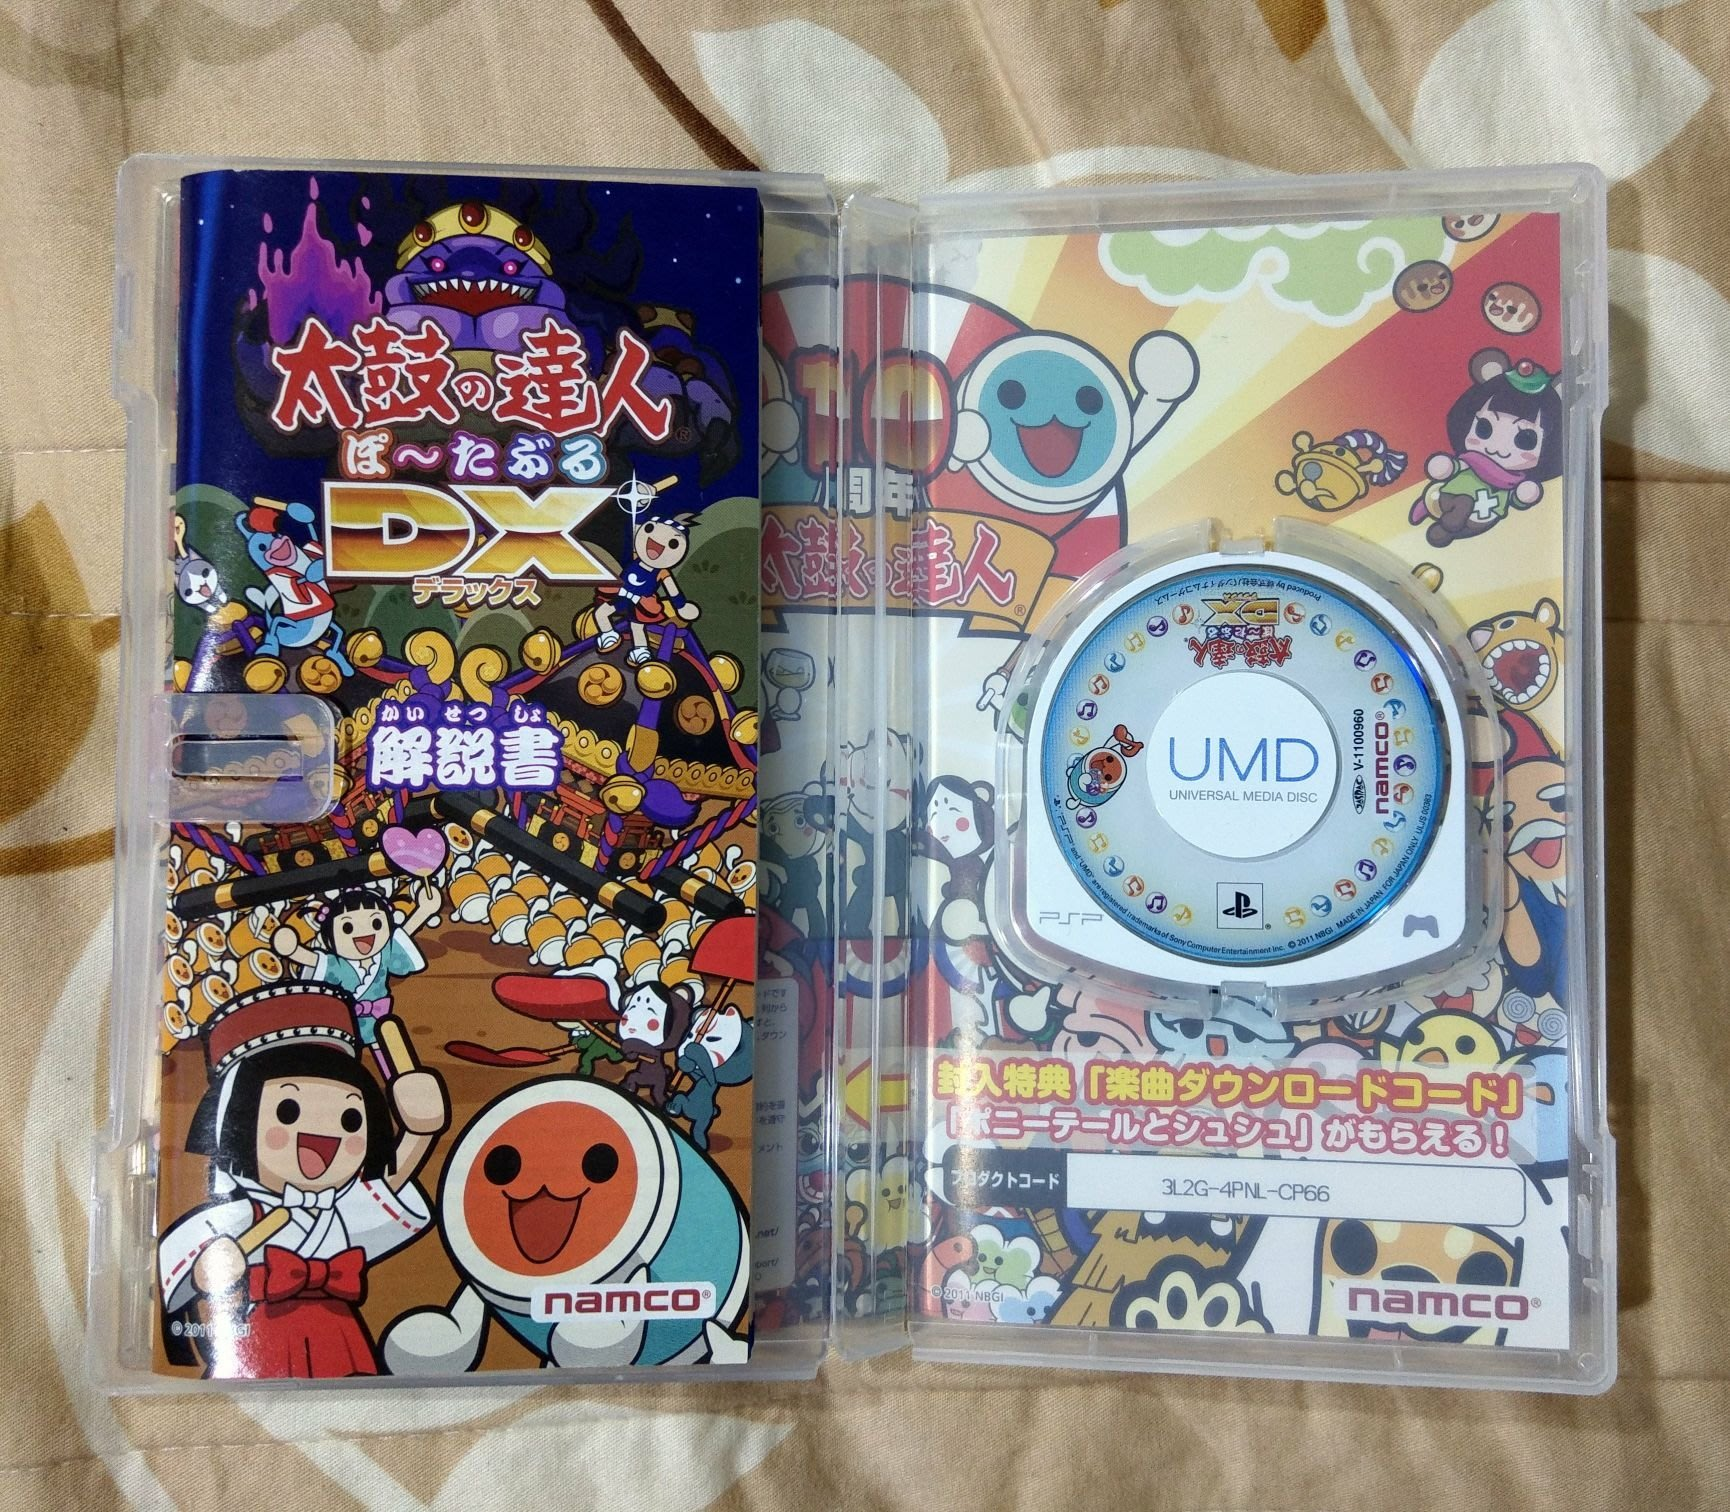 PSP 太鼓達人DX 純日版 (編號329)